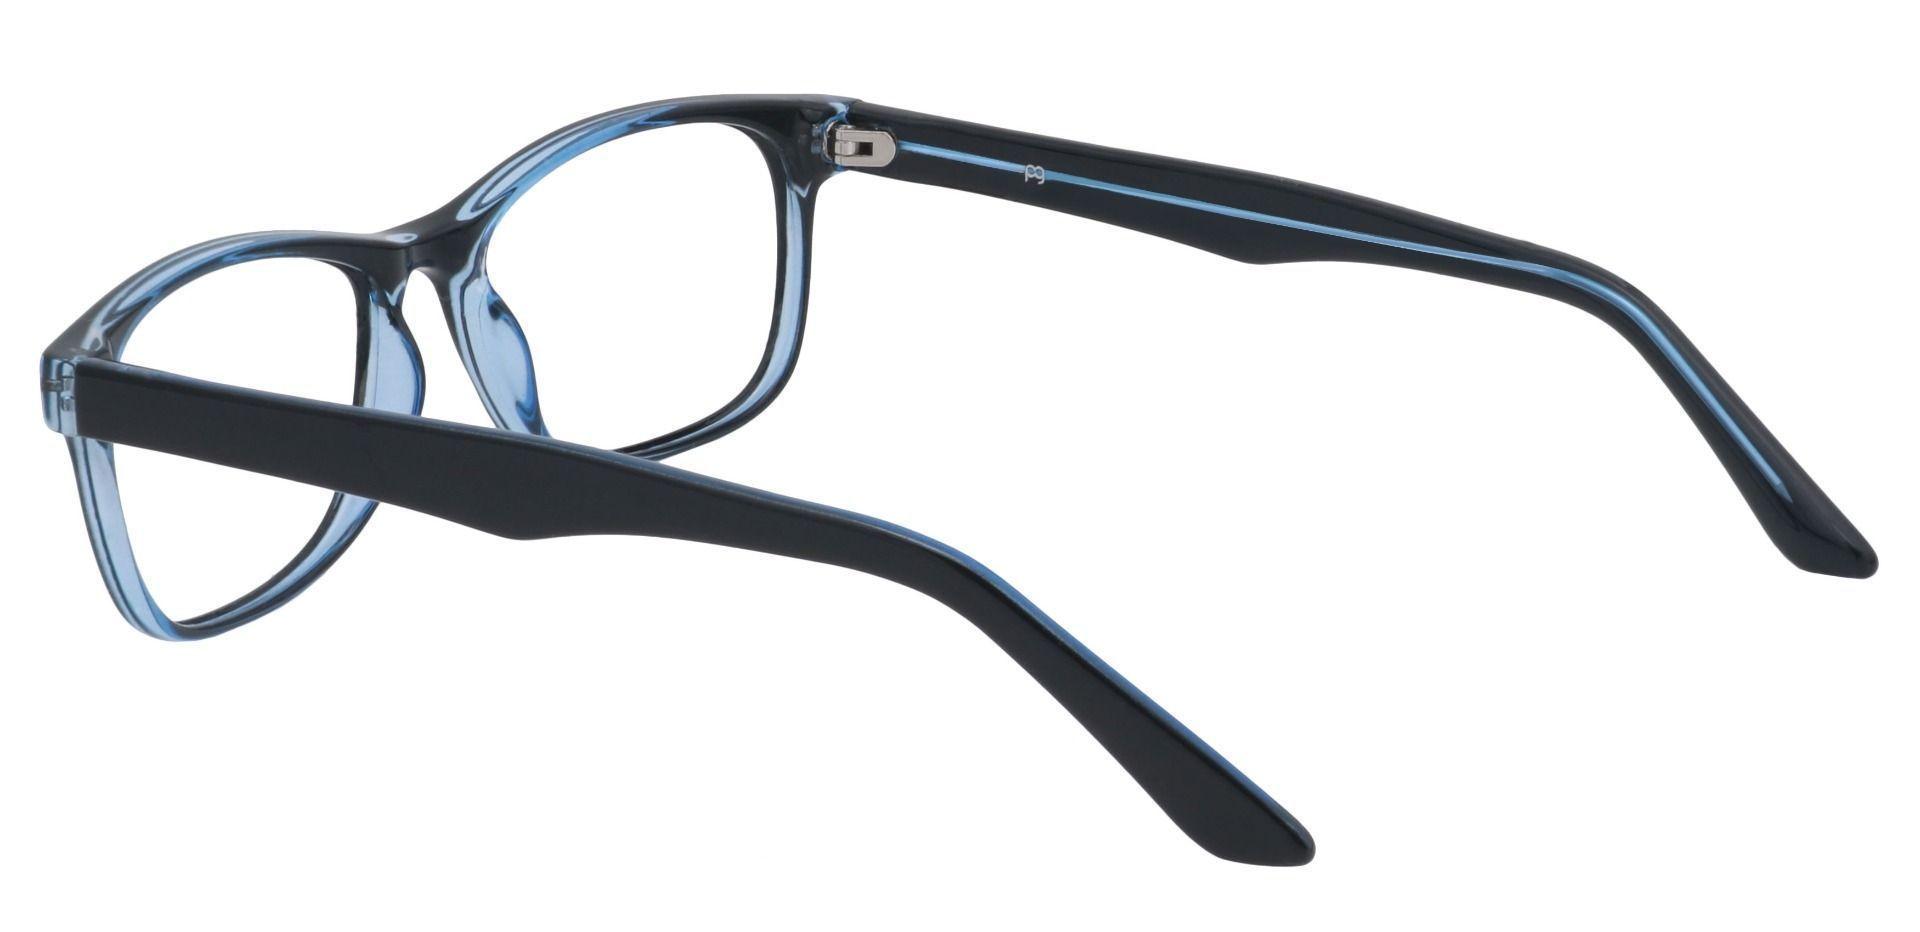 Village Rectangle Prescription Glasses - The Frame Is Black And Blue